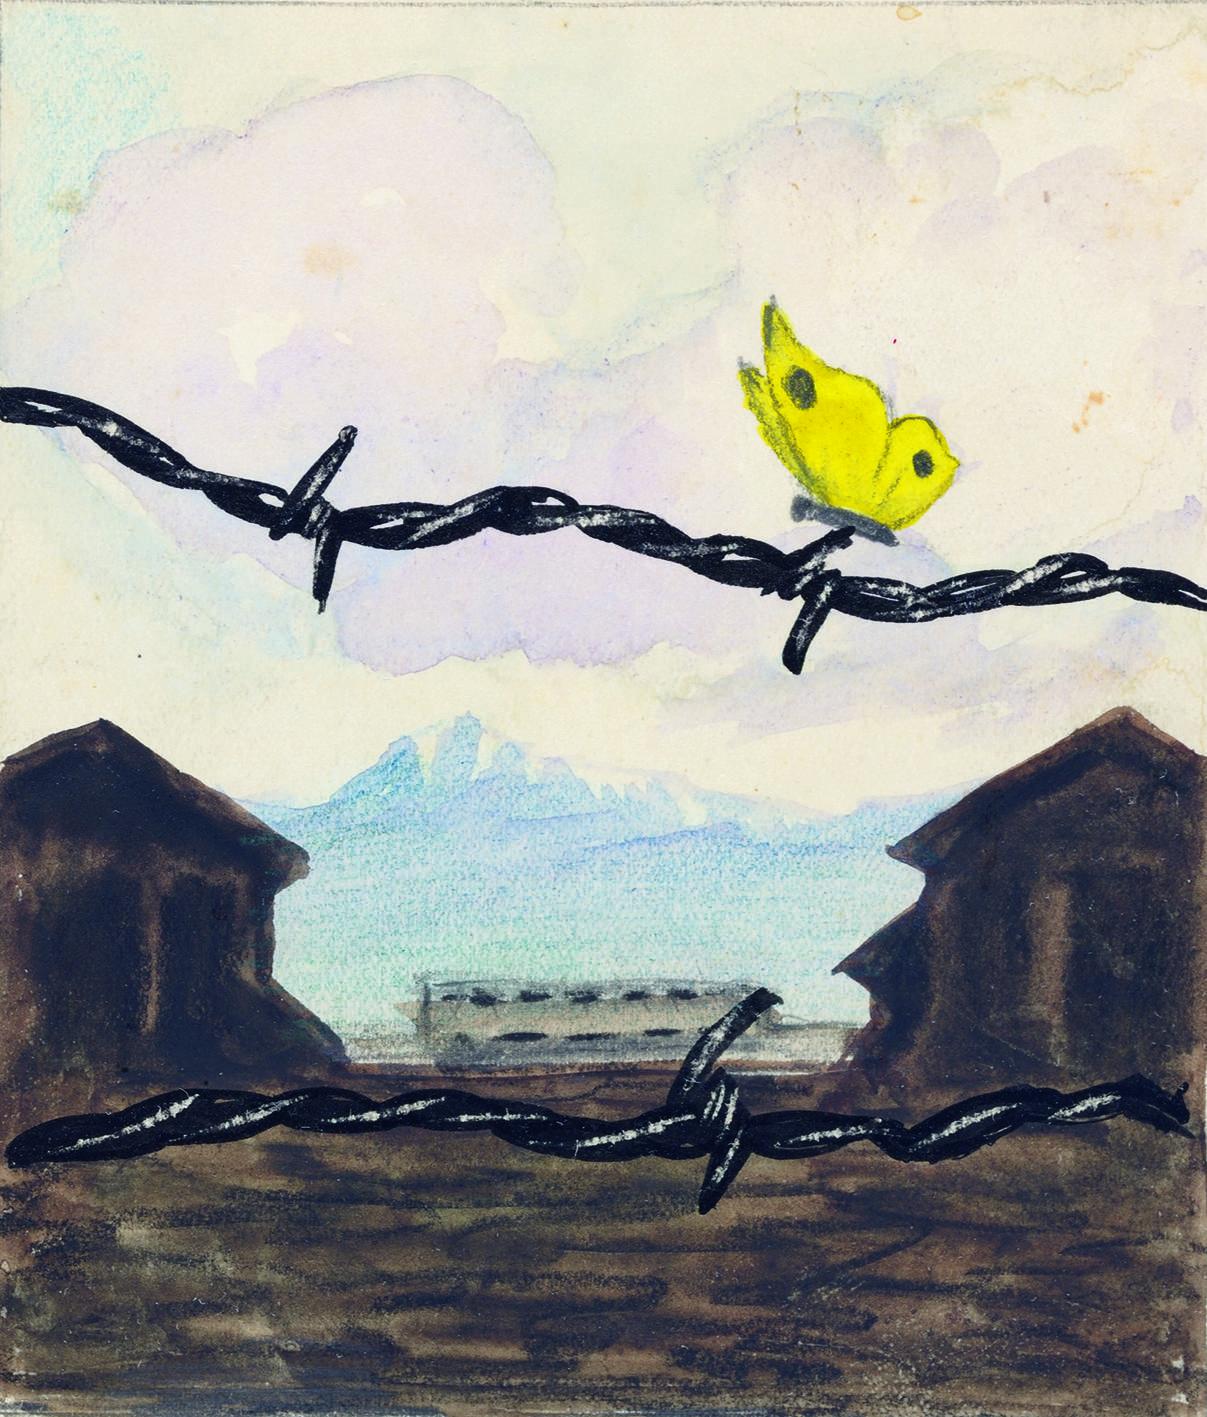 img_xmonsalve_20160128-163242_imagenes_lv_otras_fuentes_bodek__low_arte_del_holocausto-U301731815067HP--1207x1417@LaVanguardia-Web.jpg